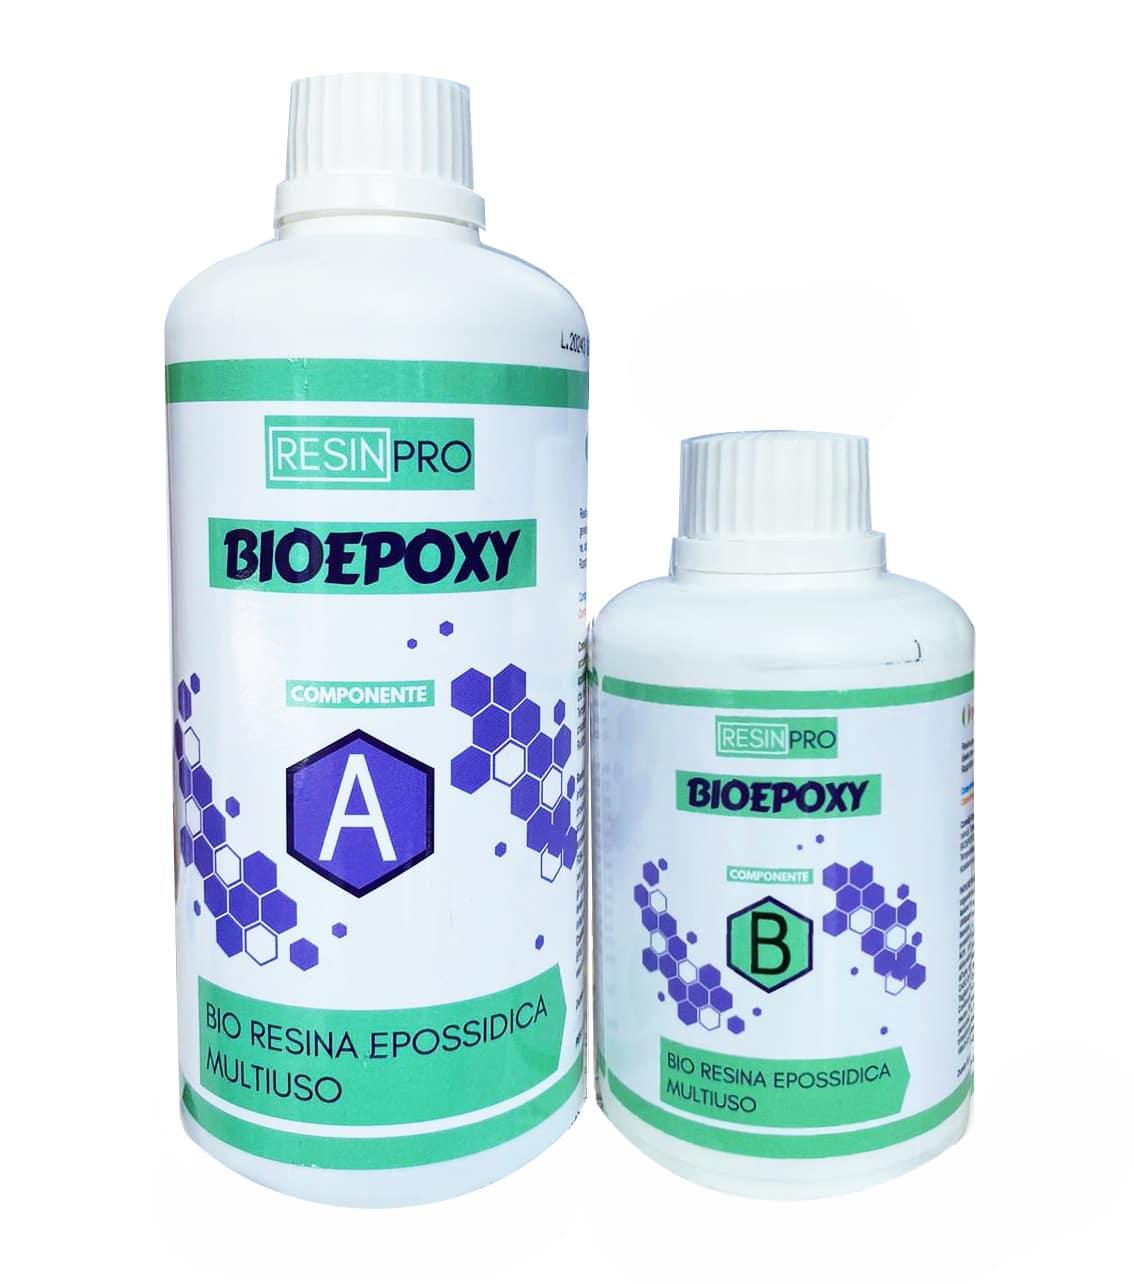 BIOEPOXY Resina Trasparente